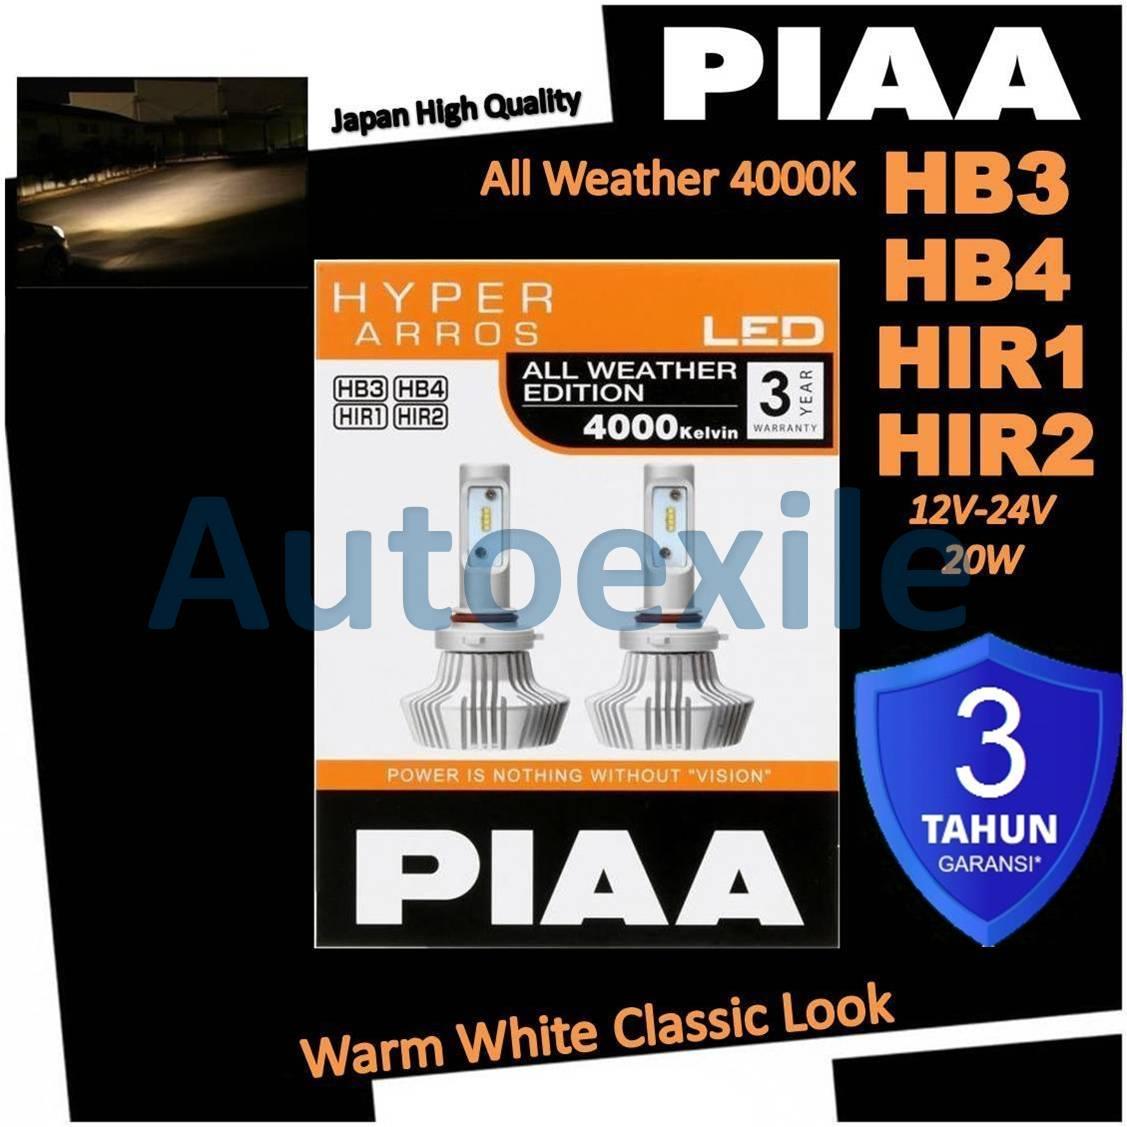 PIAA LEH131E Hyper Arros LED All Weather HB3 HB4 HIR1 HIR2 4000K Warm White Putih Kekuningan Lampu Mobil BRV CRV Innova Reborn Jazz Fortuner Rush Xenia New Pajero Terios XI New Civic Celica Outlander Sport Brio RS CHR Mobilio RS New Yaris Avanza Grandis